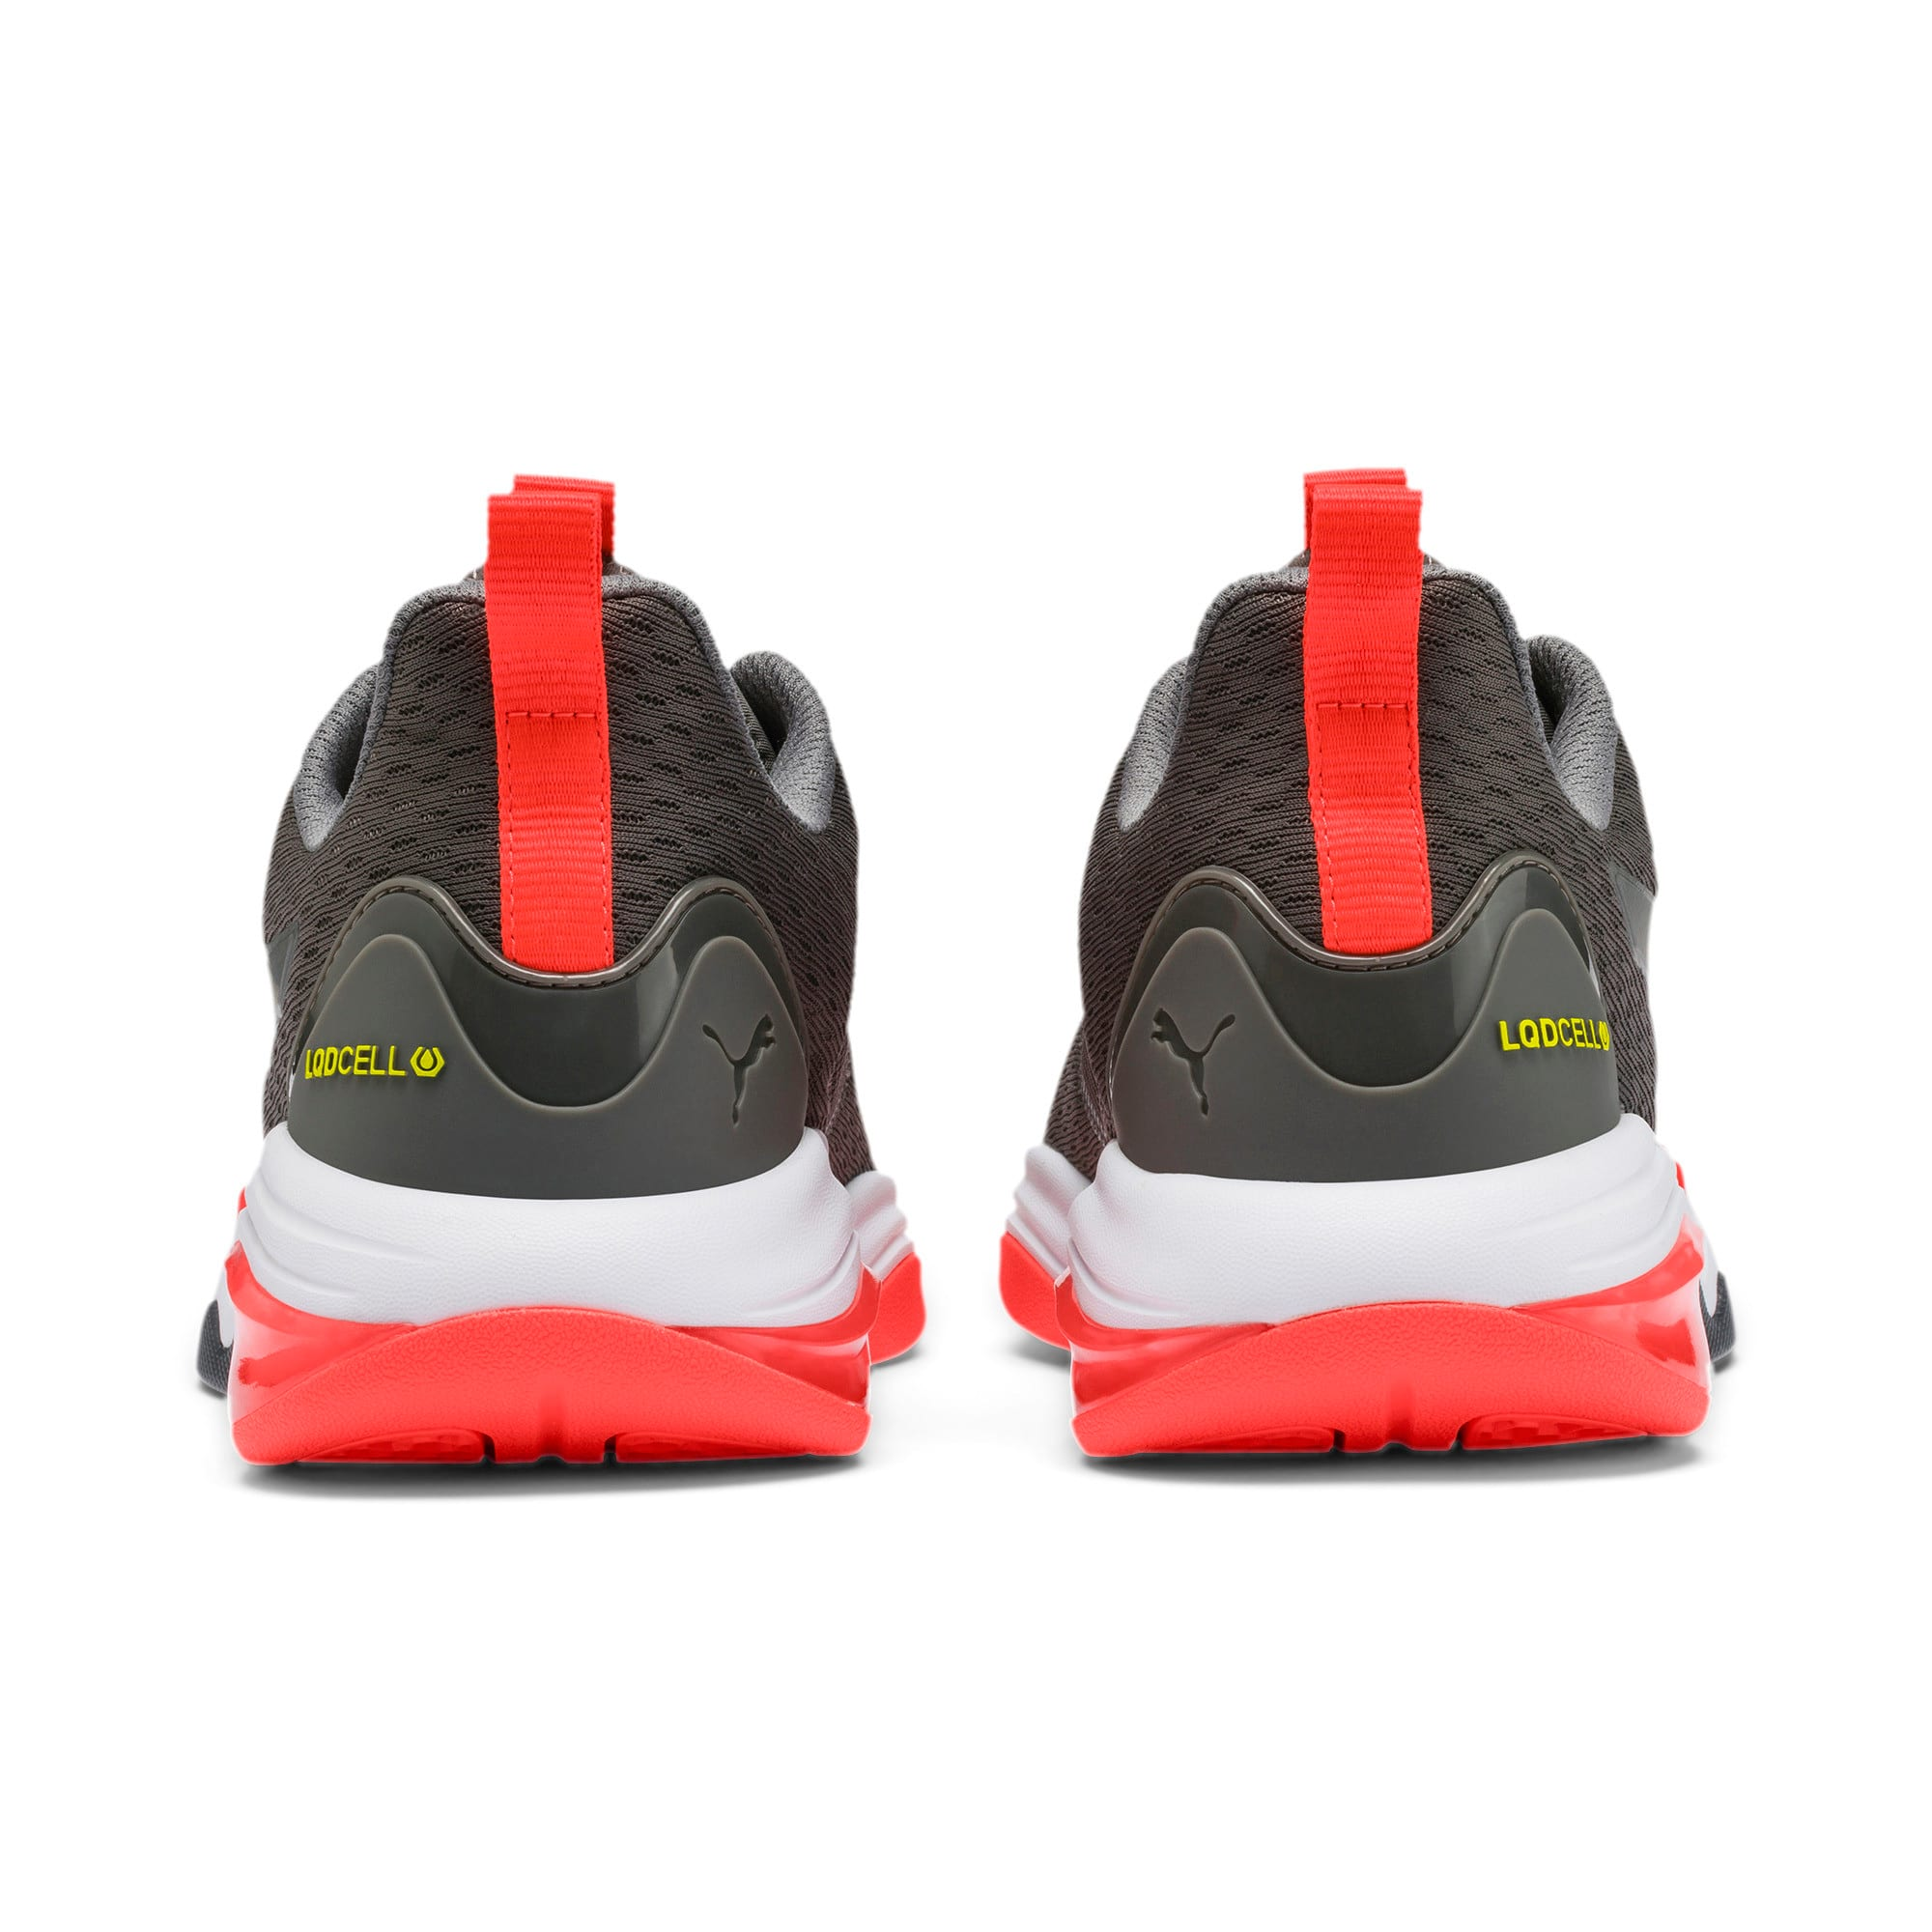 Thumbnail 4 of LQDCELL Tension Men's Training Shoes, CASTLEROCK-Nrgy Red-Y Alert, medium